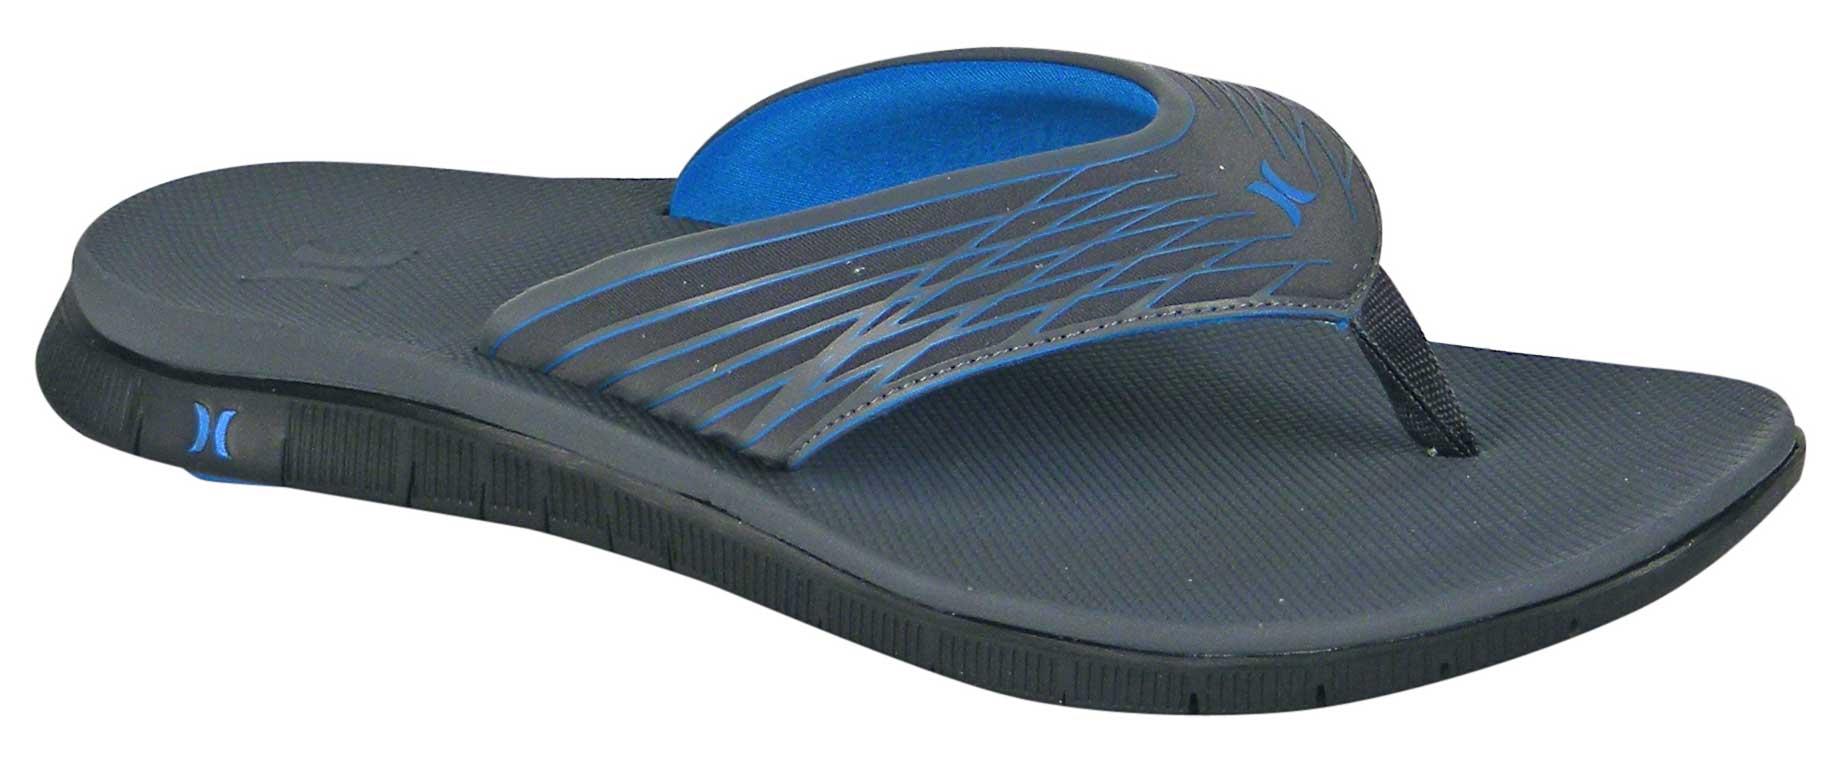 release date 01268 b2f52 Hurley Phantom + Nike Free Technology | Cheryl Tay